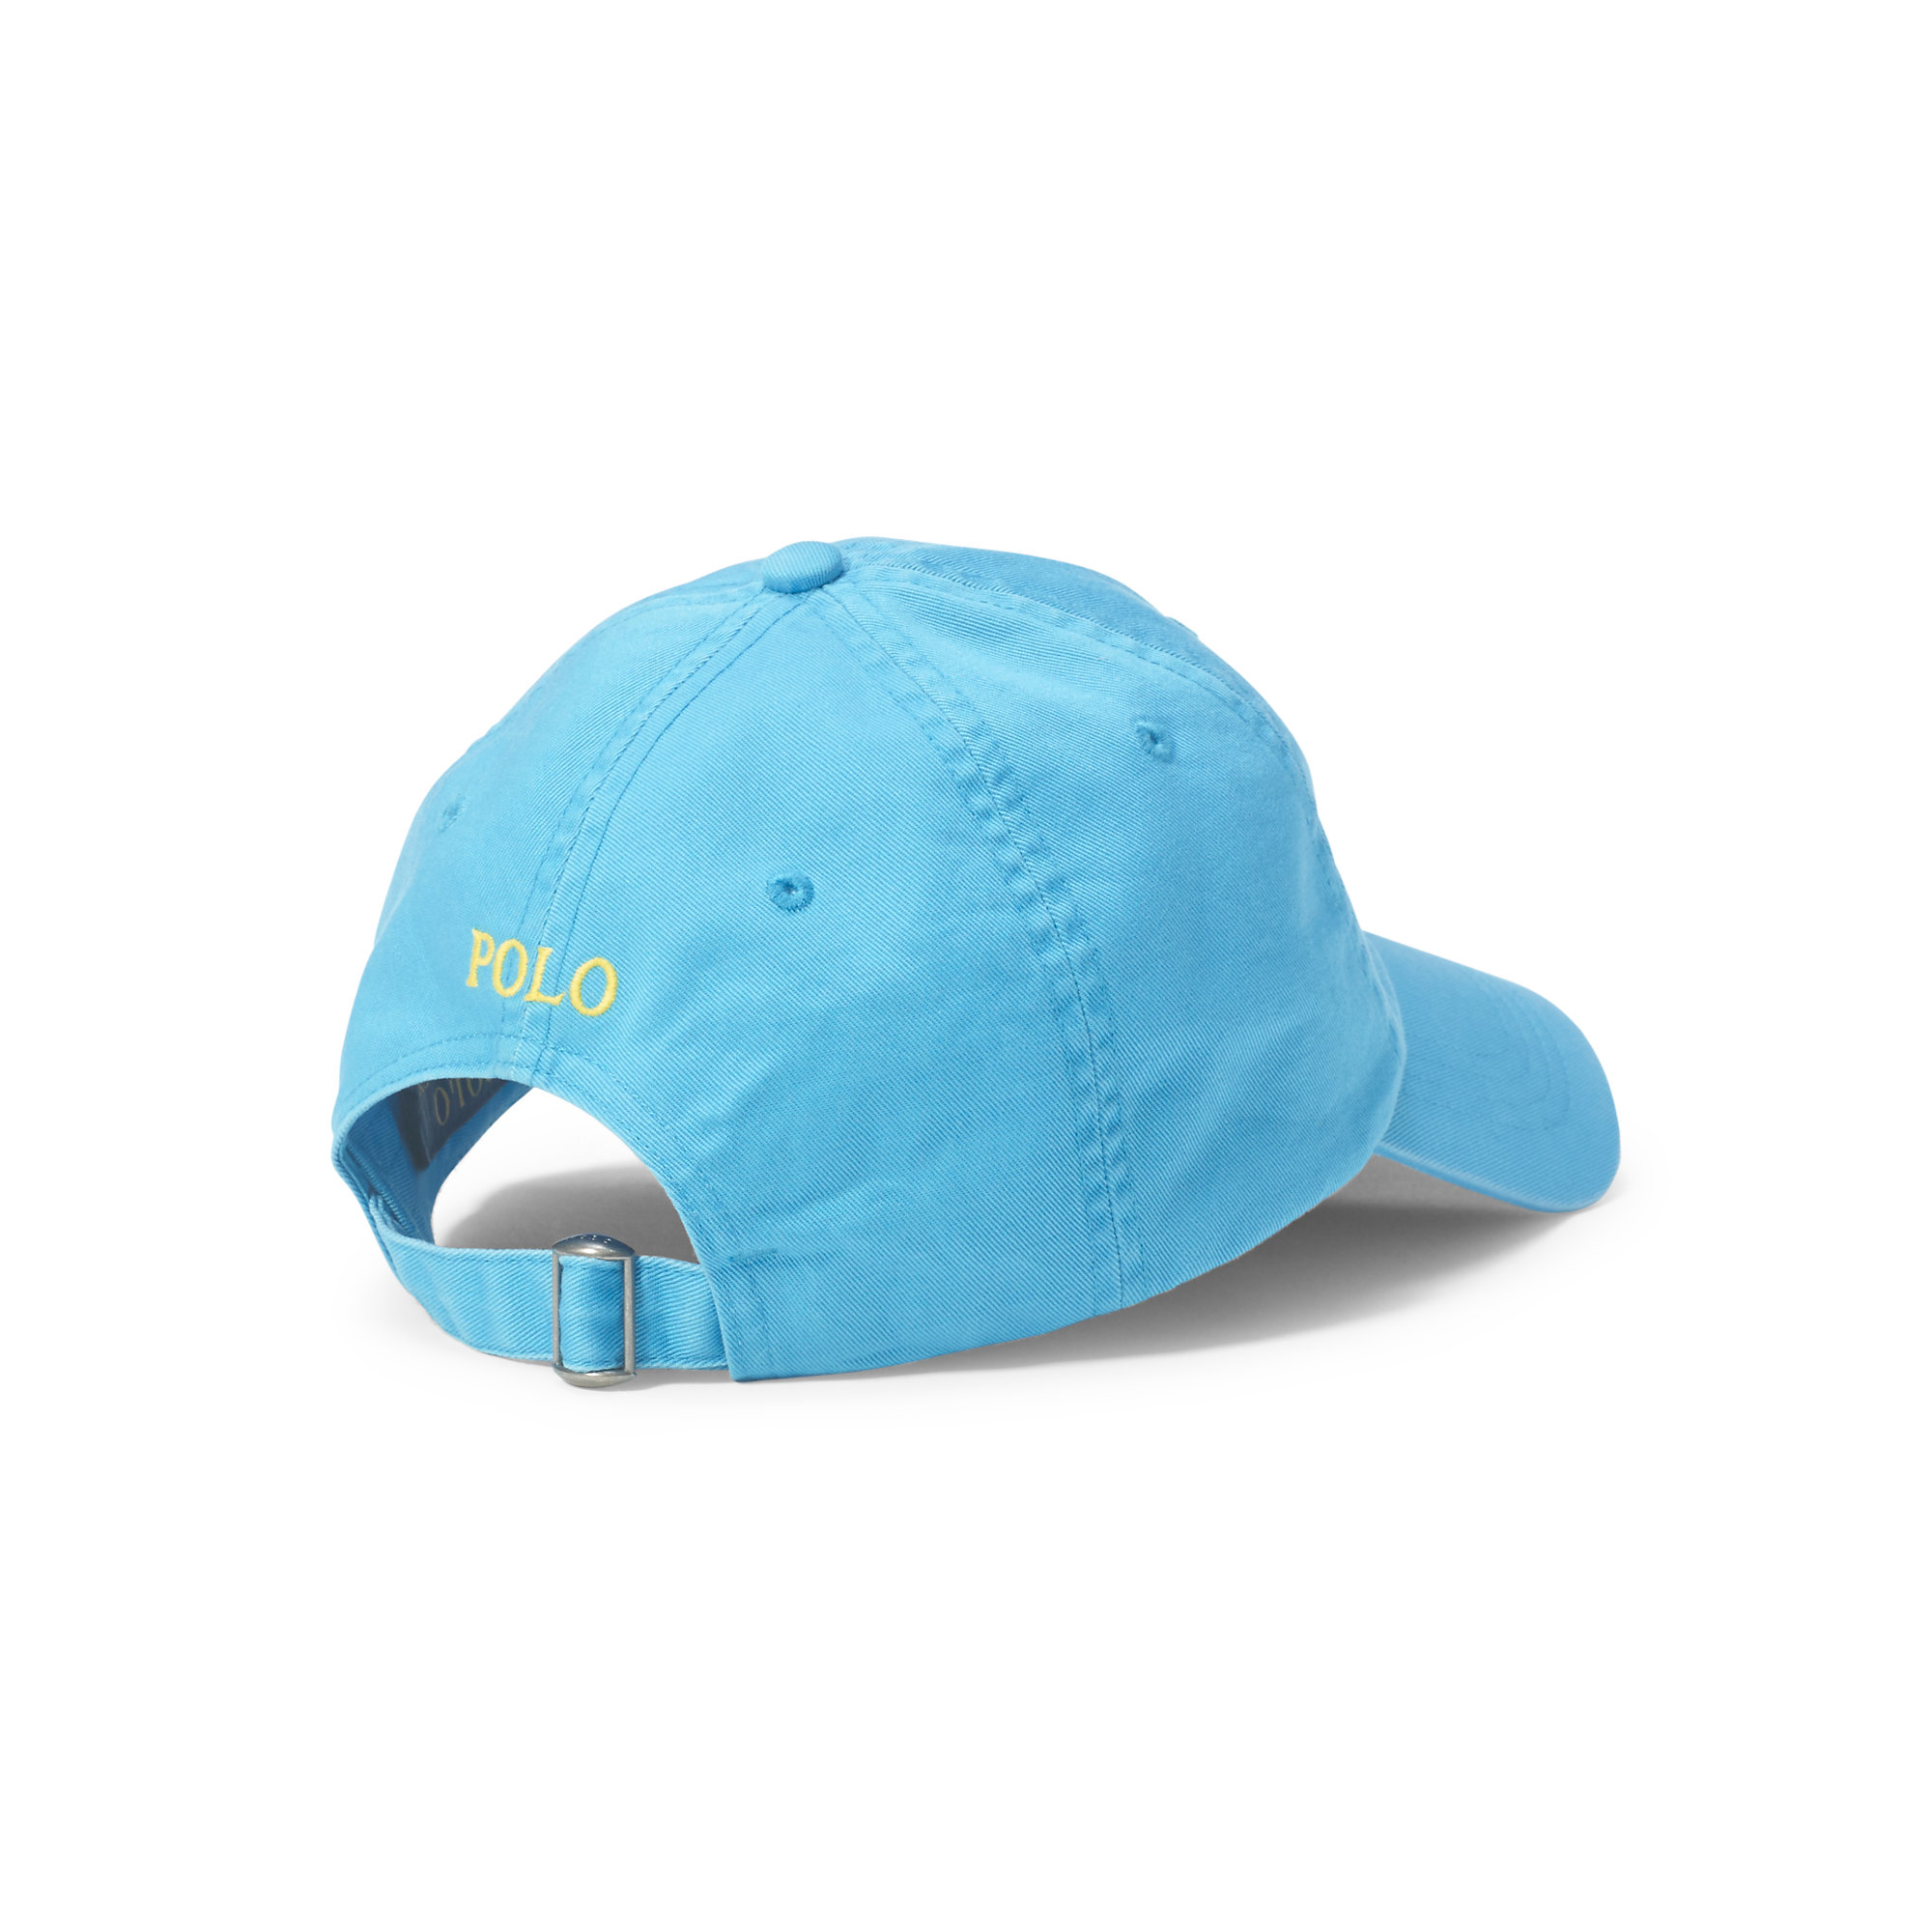 polo ralph lauren cotton chino baseball cap in blue for men lyst. Black Bedroom Furniture Sets. Home Design Ideas